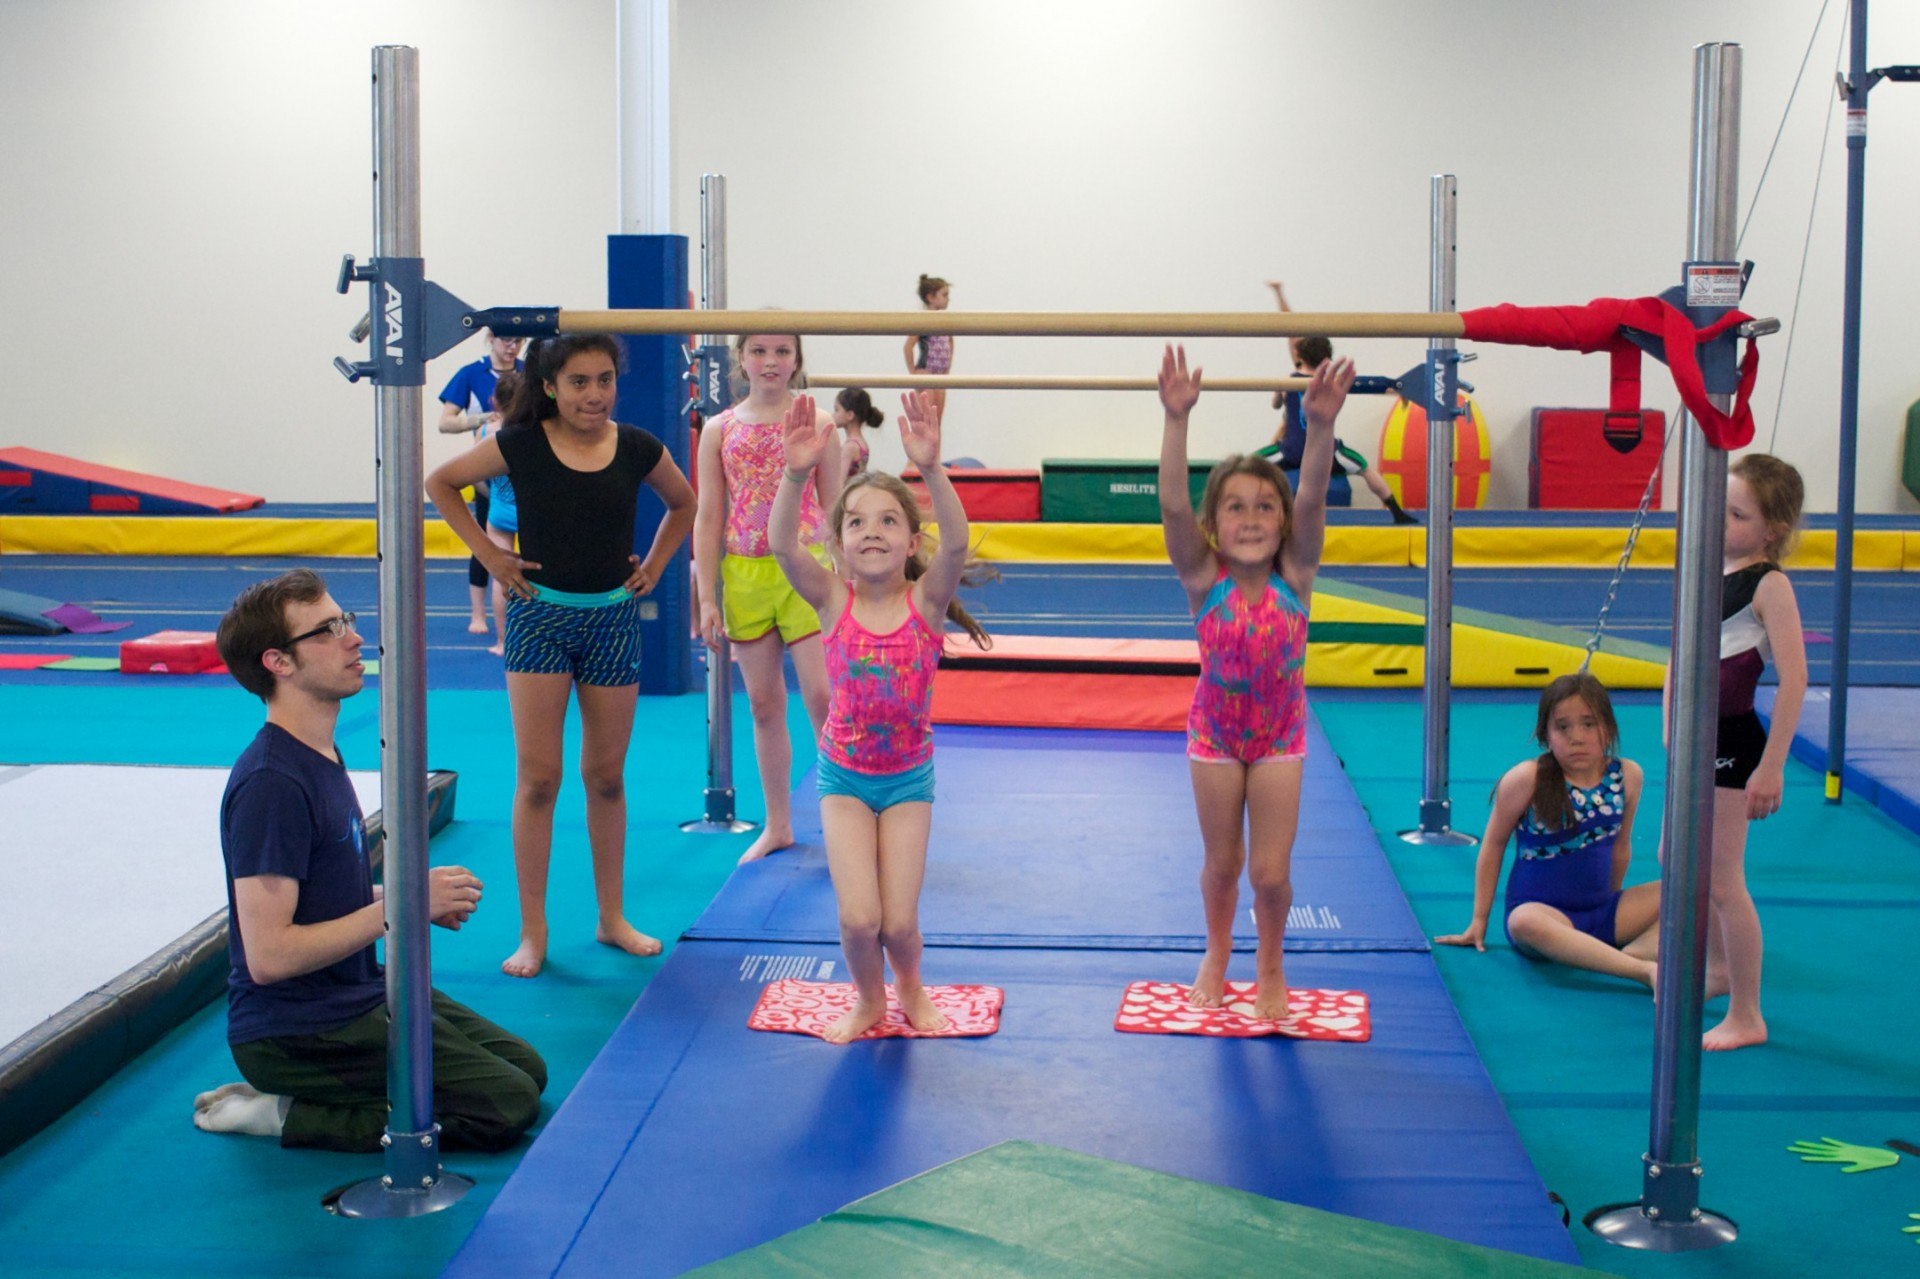 PreSchool Gymnastics - Saco Valley Gymnastics Training Center